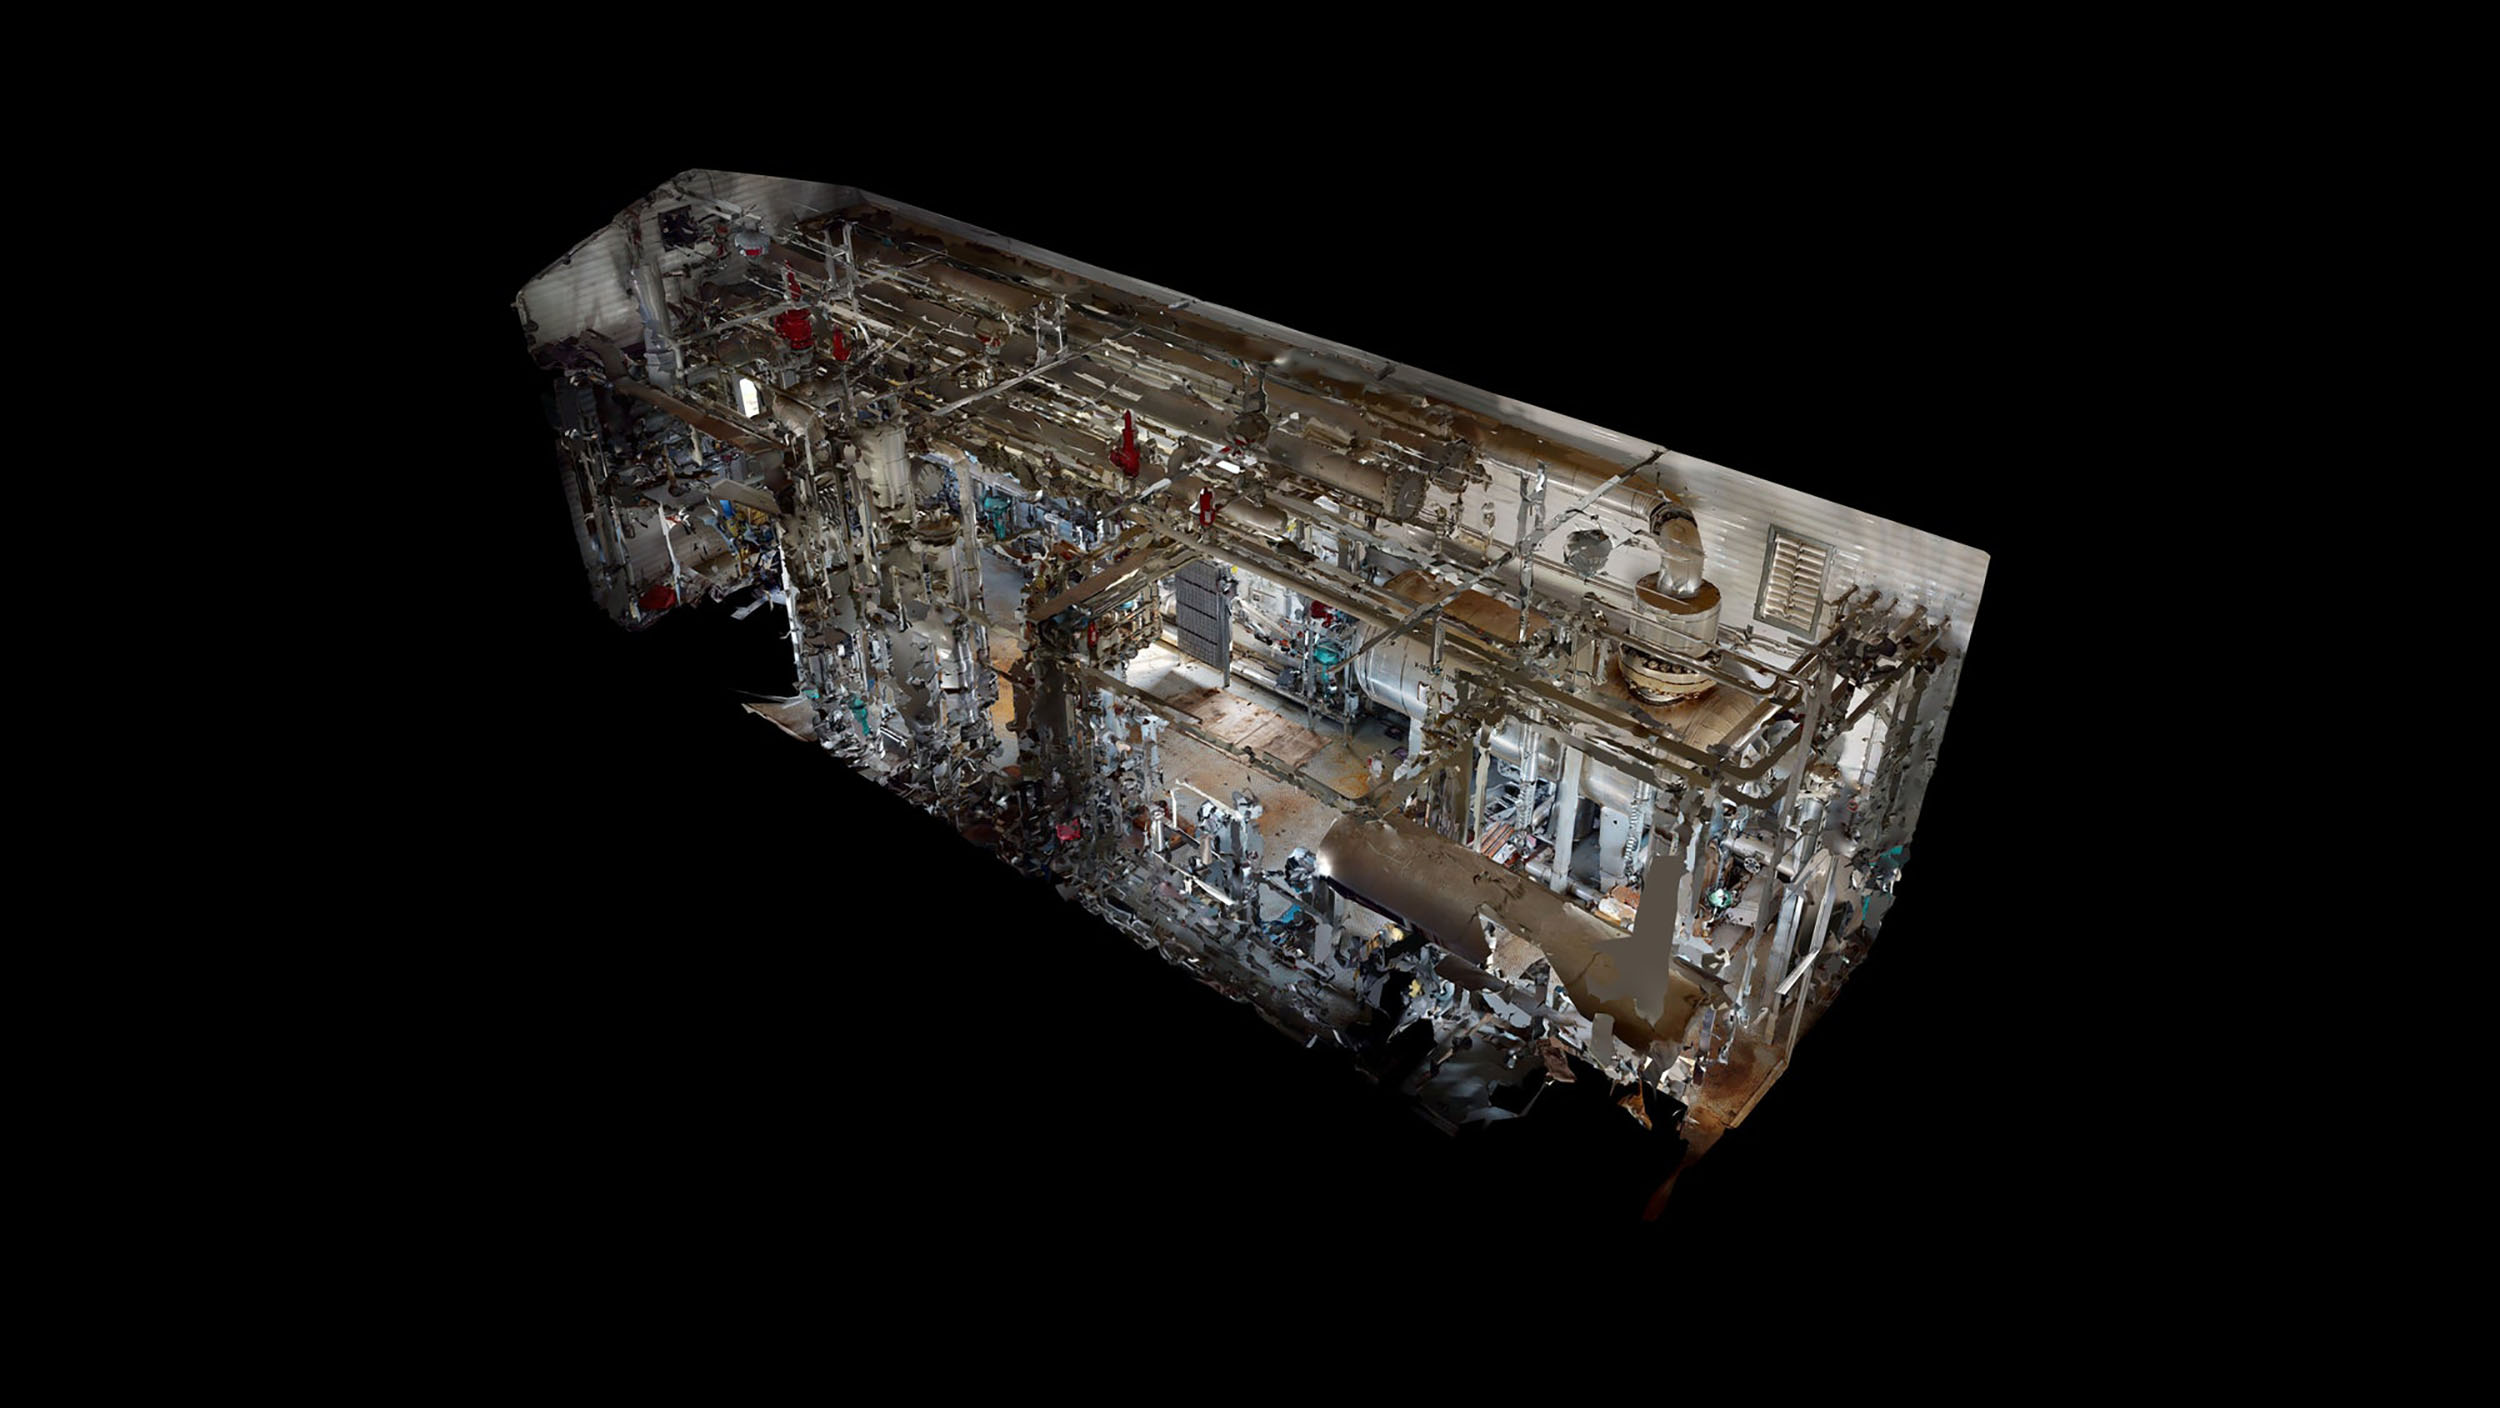 Used Surplus 12 – 15 MMSCFD 600# ANSI Gas Refrigeration Plant for Sale in Grande Prairie / DeBolt, Alberta, Canada –Built by Toromont Process / Enerflex –Surplus Oilfield, Oil & Gas and Energy Equipment matterport